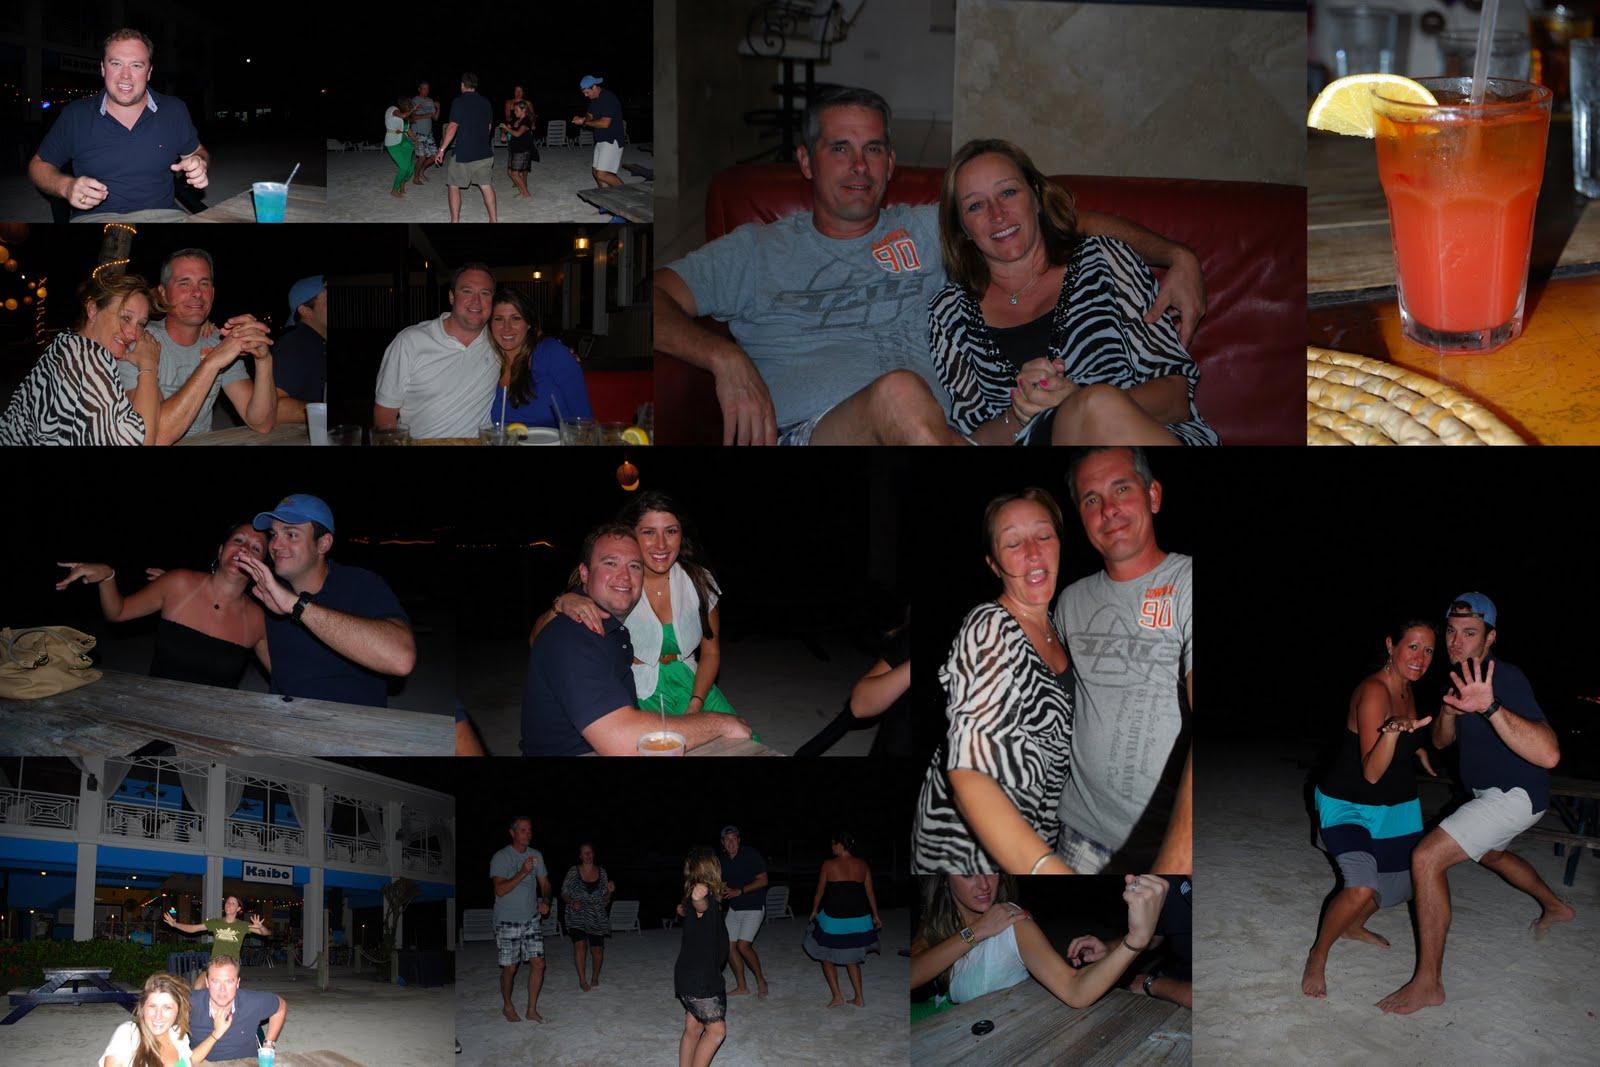 http://3.bp.blogspot.com/_nFtVVZXHlBM/TR4B8j9IgaI/AAAAAAAAGS0/ka_7dIw_vUk/s1600/Nicole+Cayman+Pics1.jpg